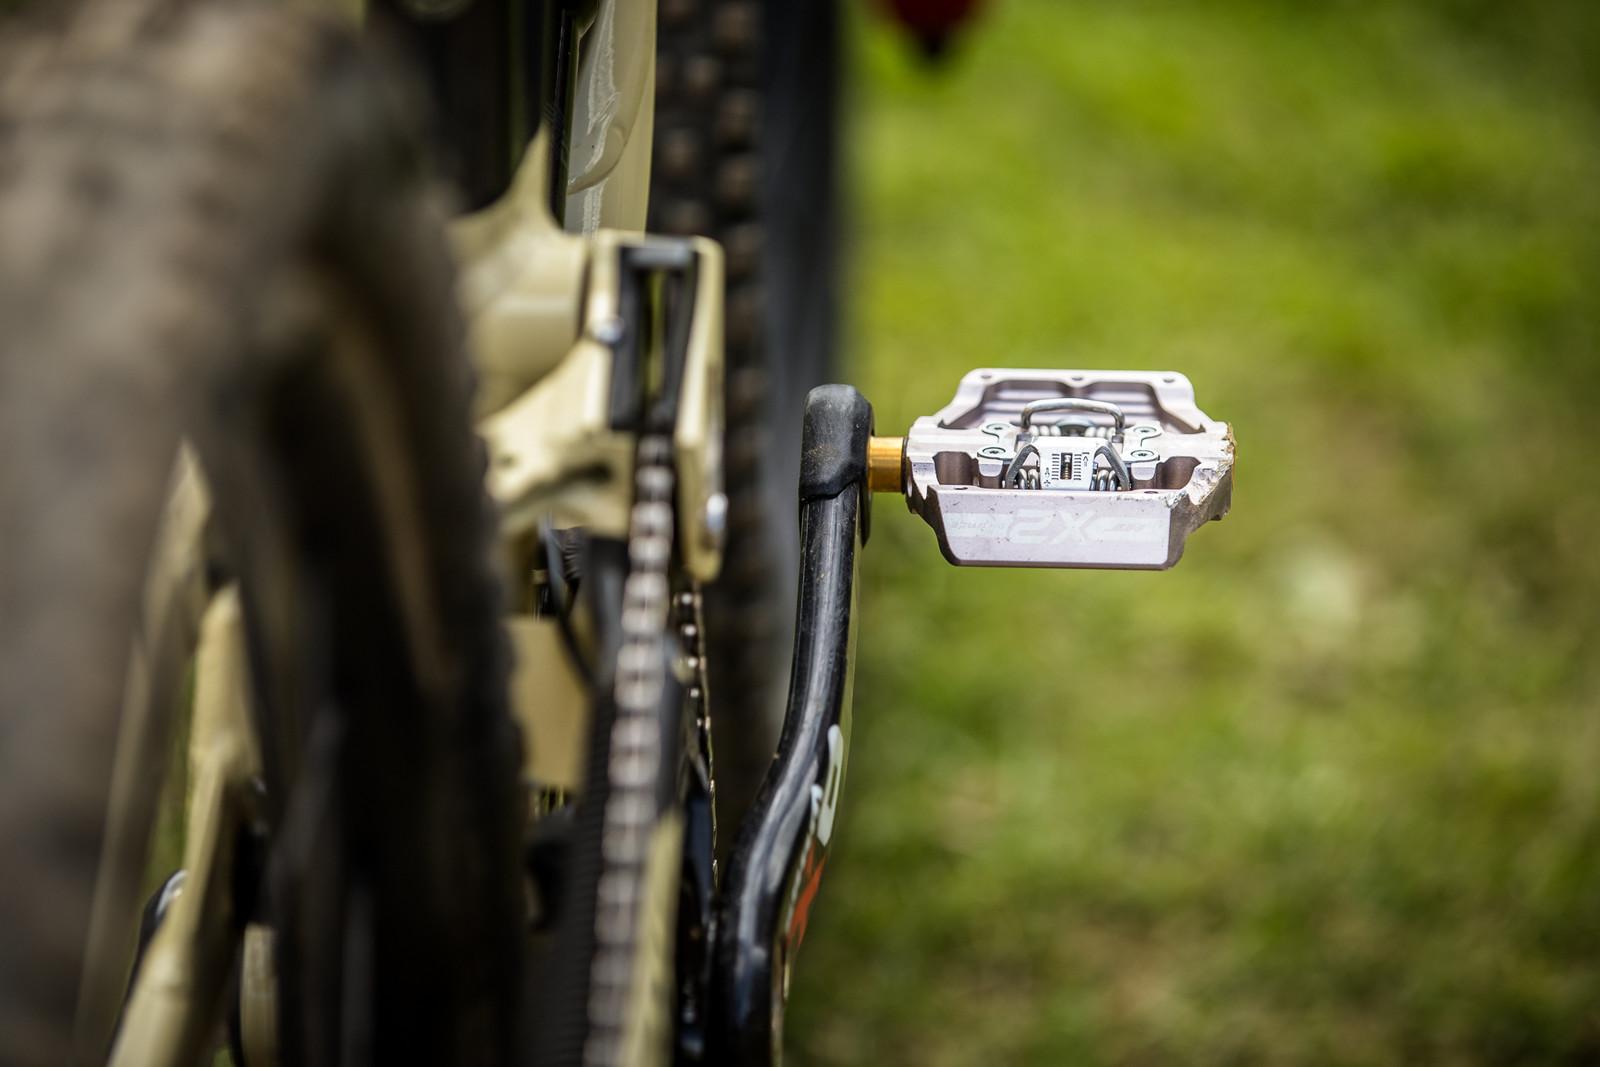 More HT X2 Domination - WINNING BIKE - Amaury Pierron's Commencal Supreme DH 29 - Mountain Biking Pictures - Vital MTB